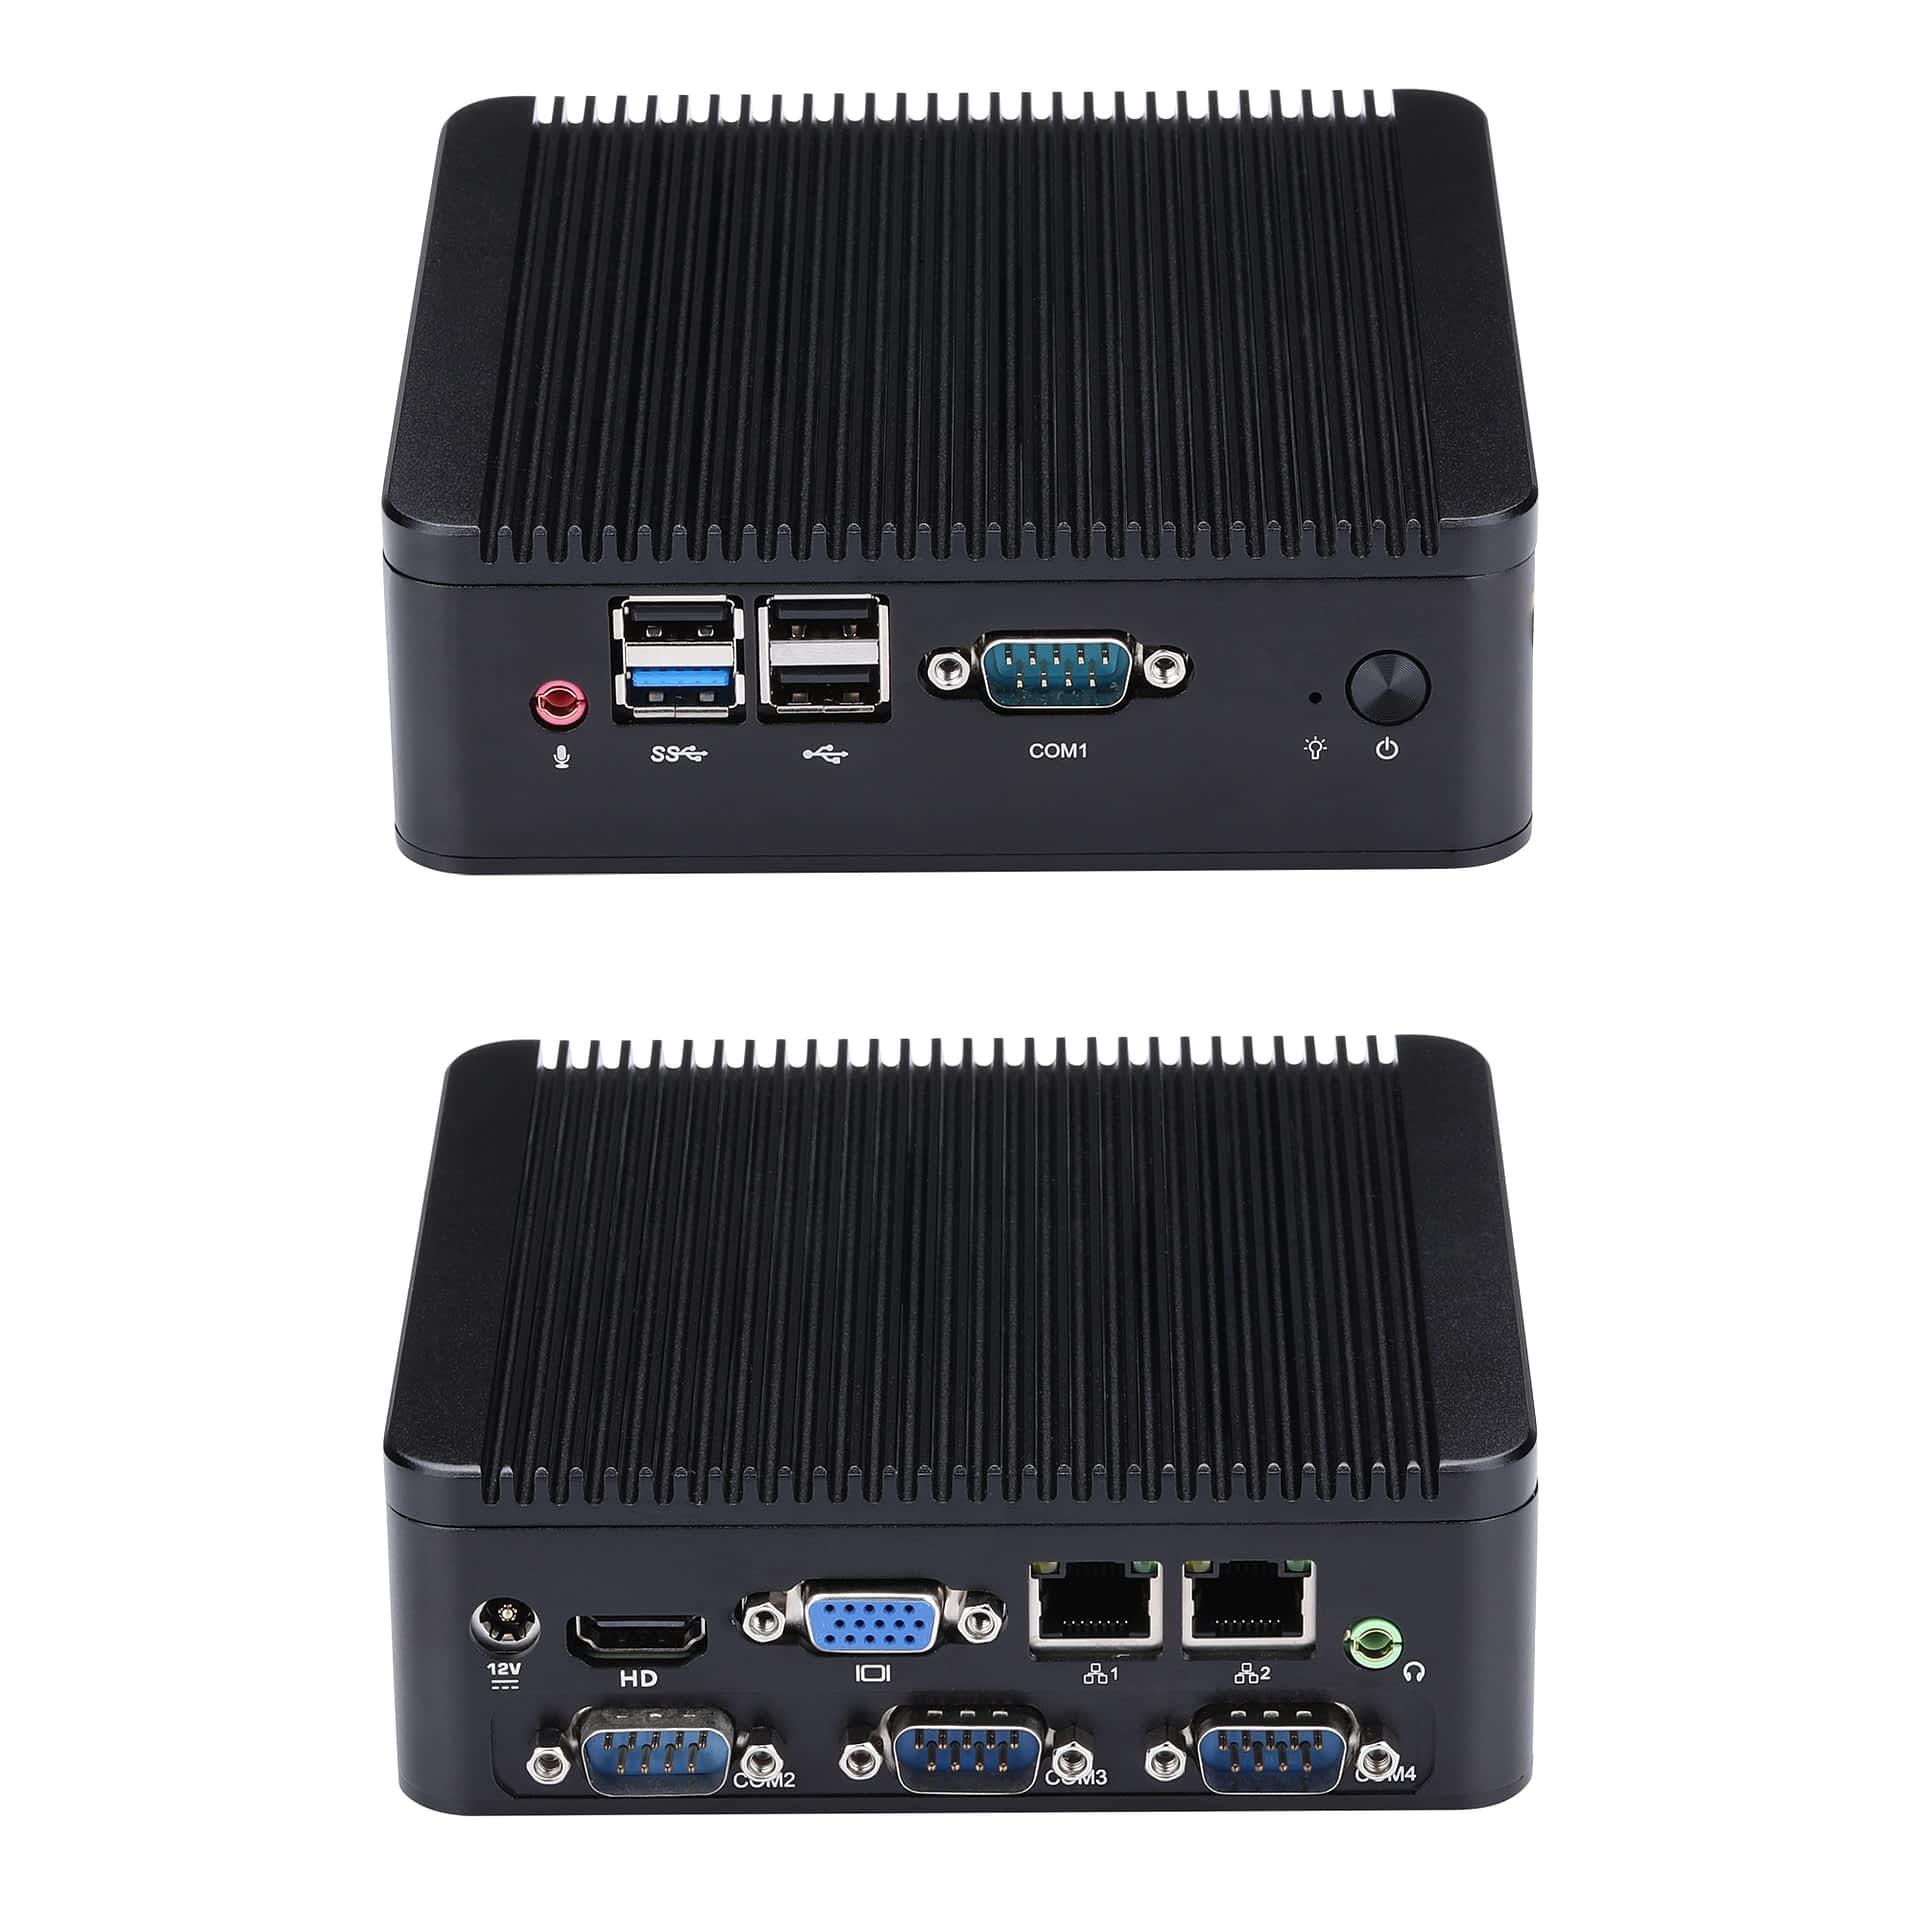 FAST-4-RS232-MINI-PC-J1800-J1900-mini-living-room-PC-HTPC-host-industrial-computer-Celeron.jpg